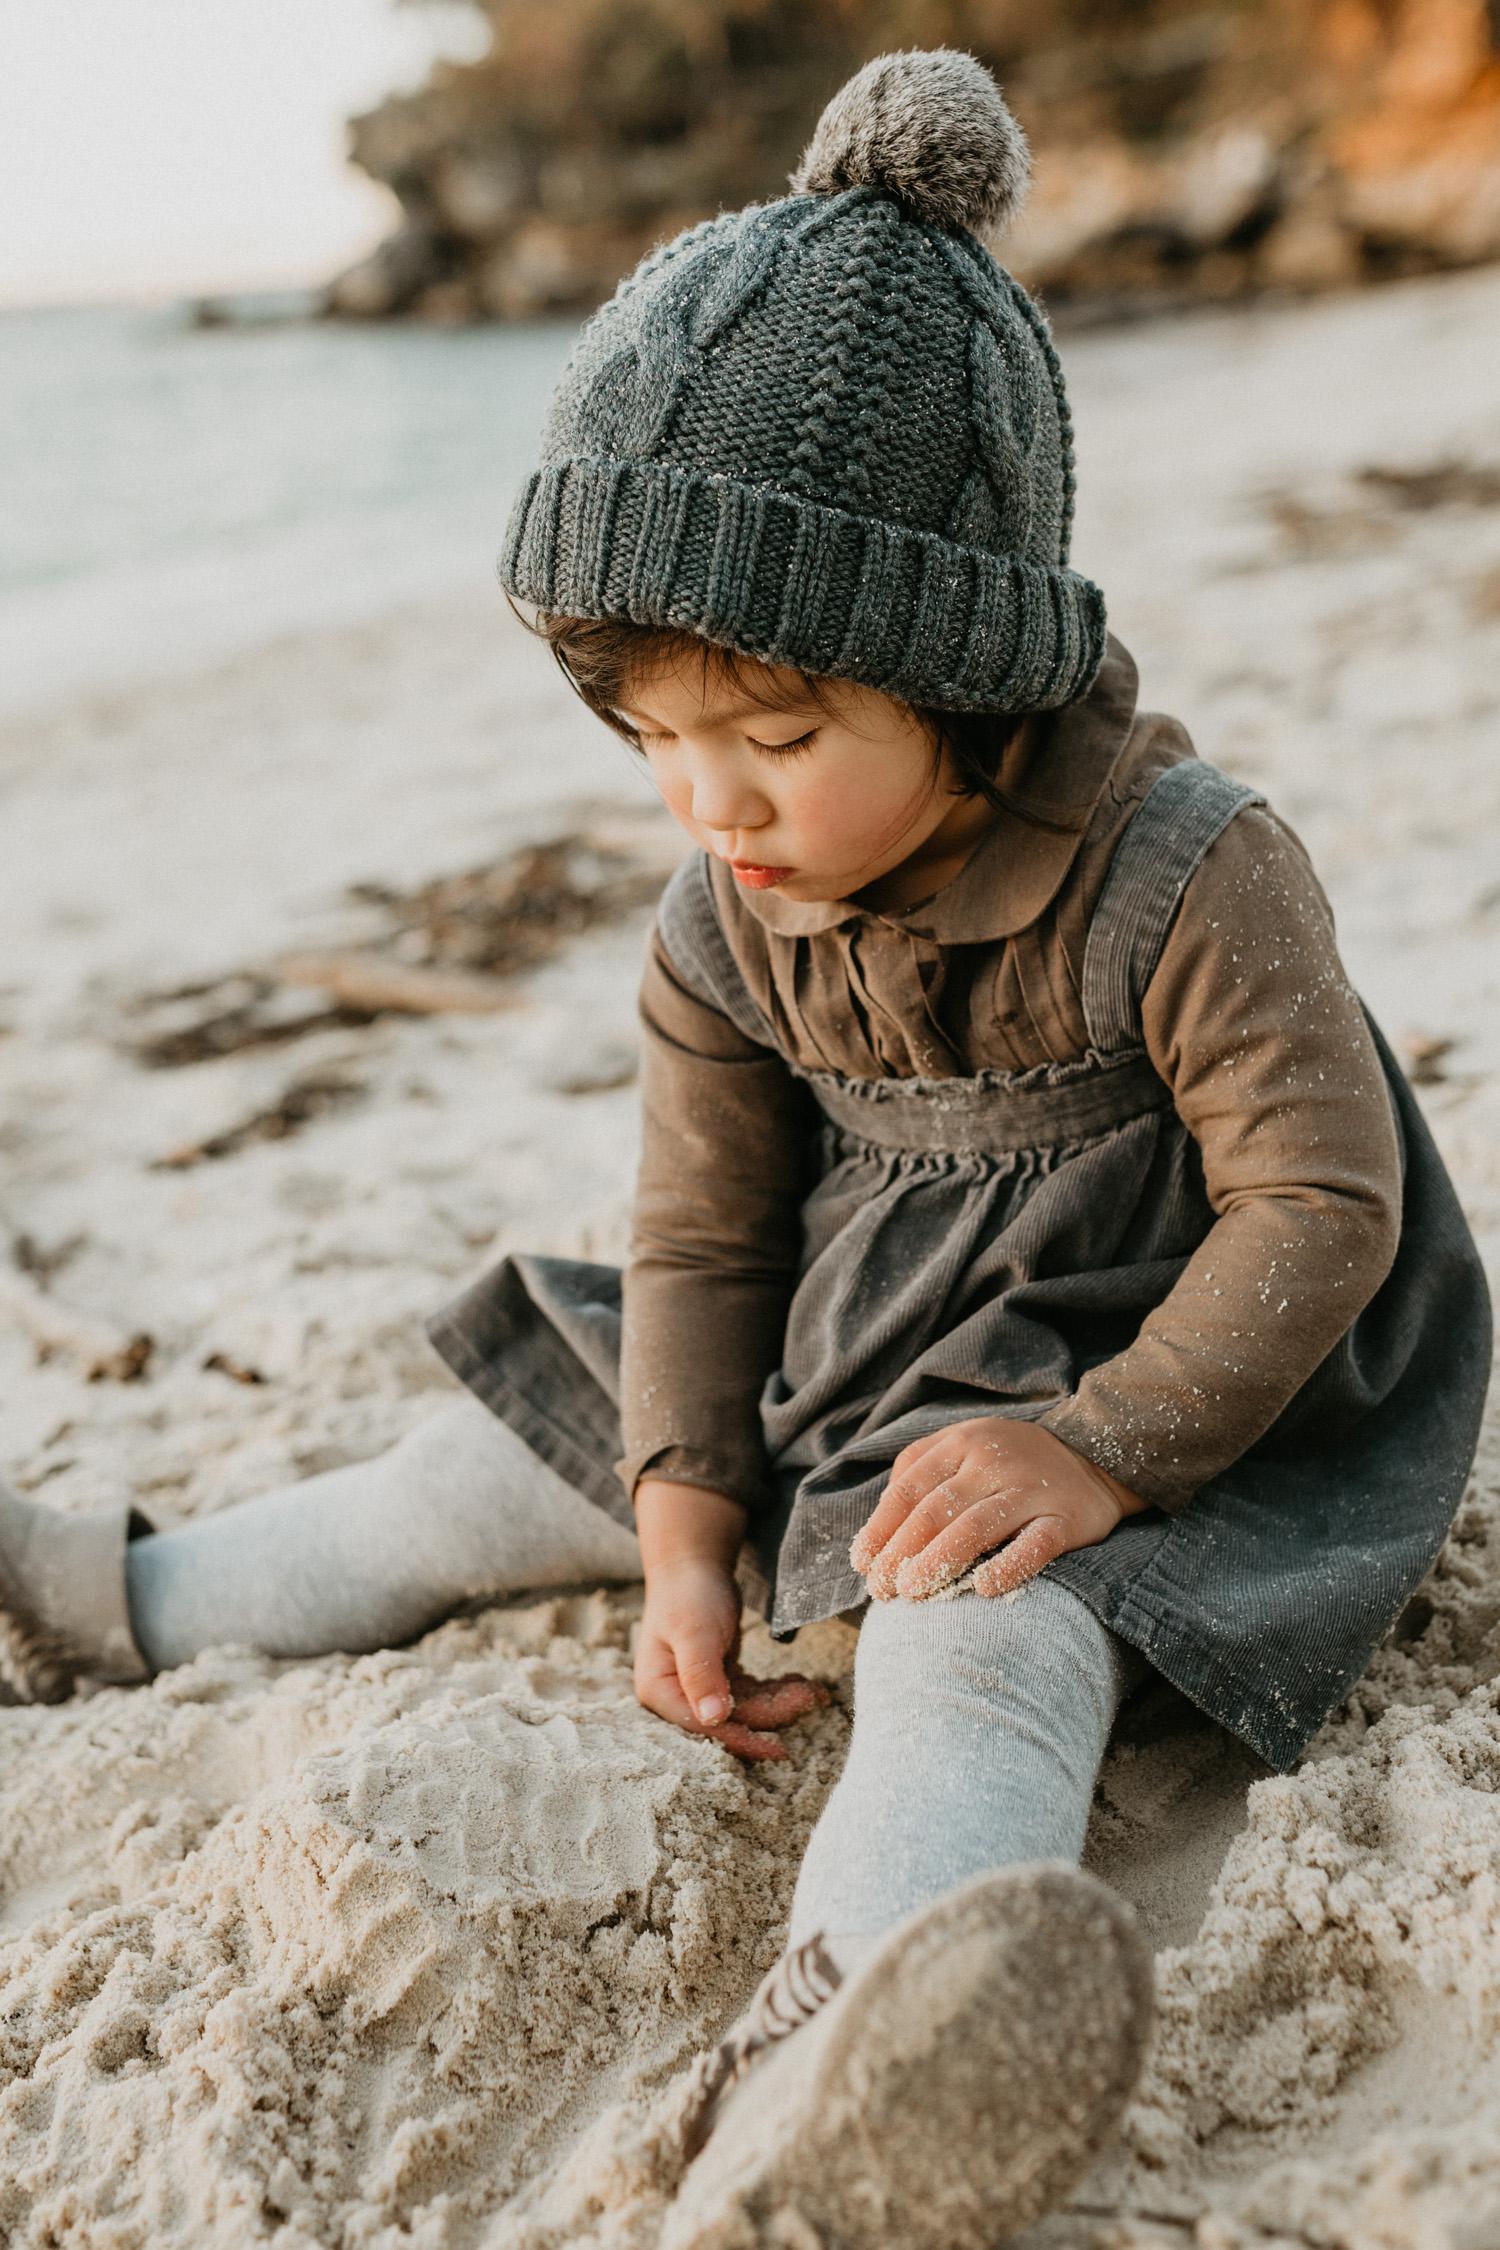 Beach Natural Children Photography Session-3.jpg